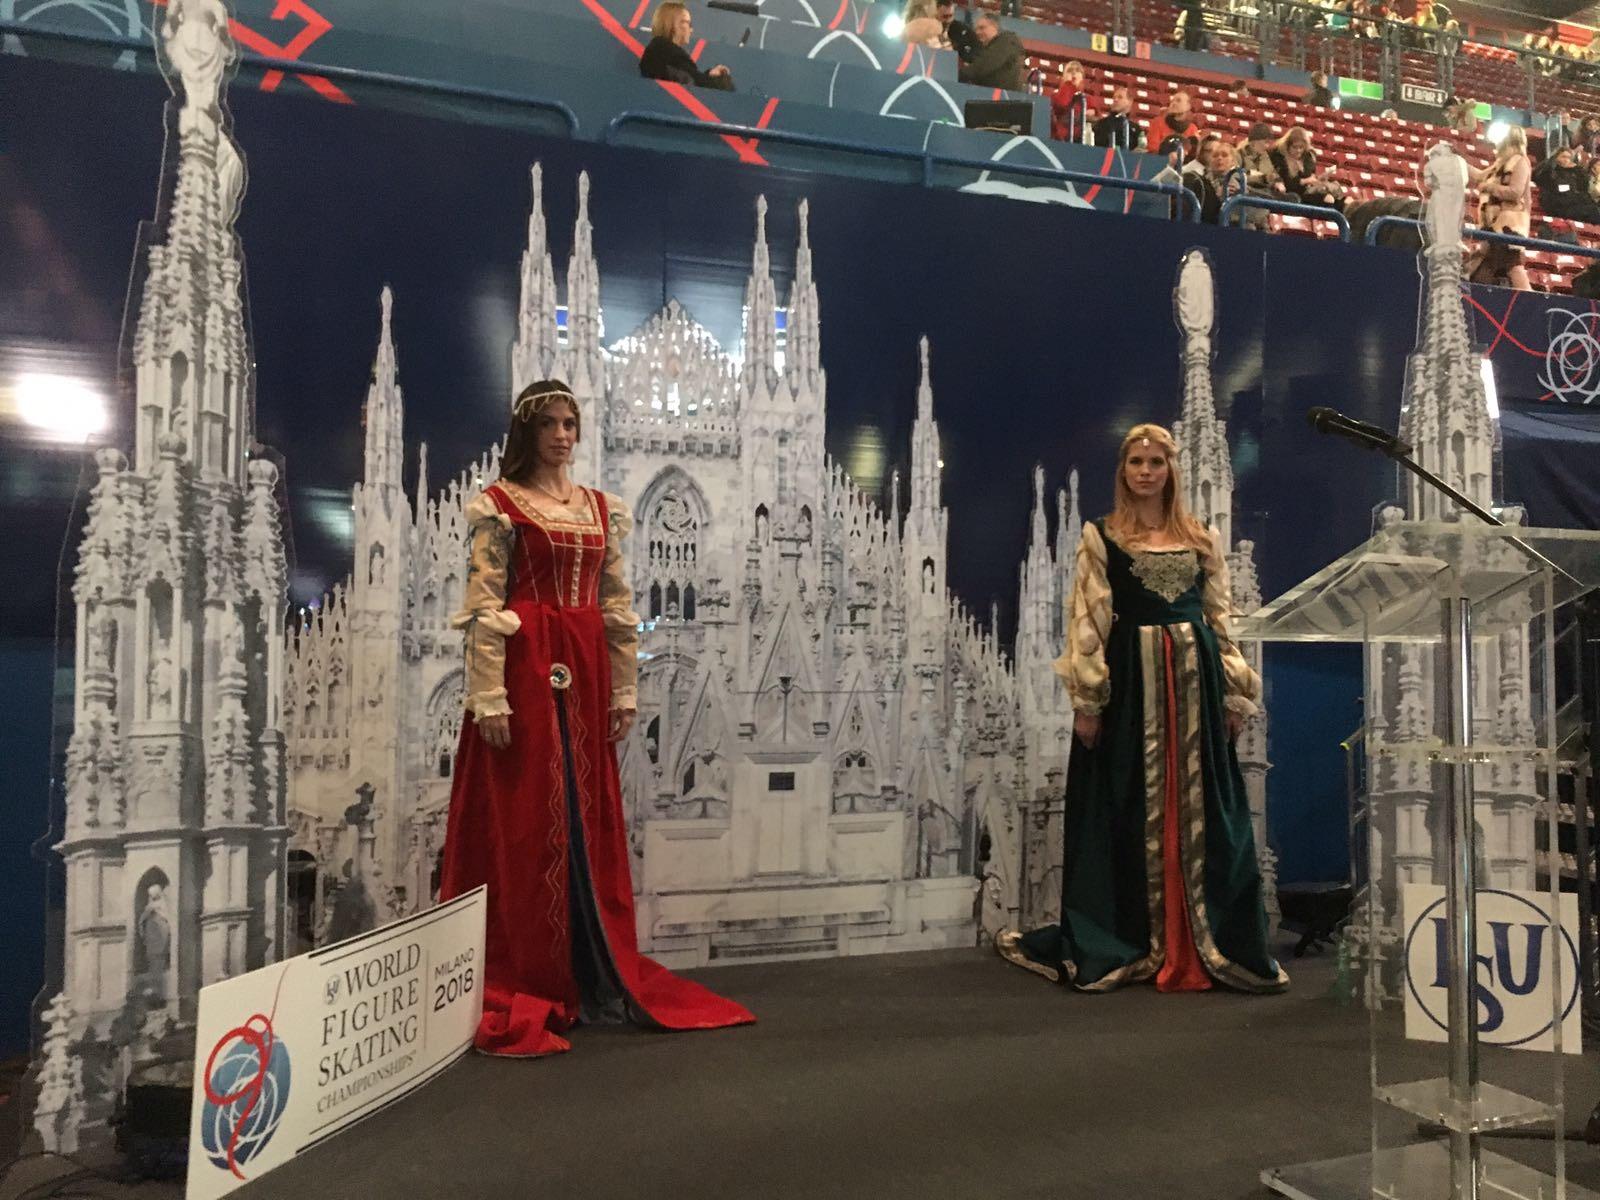 modelle evento sportivo forum milano